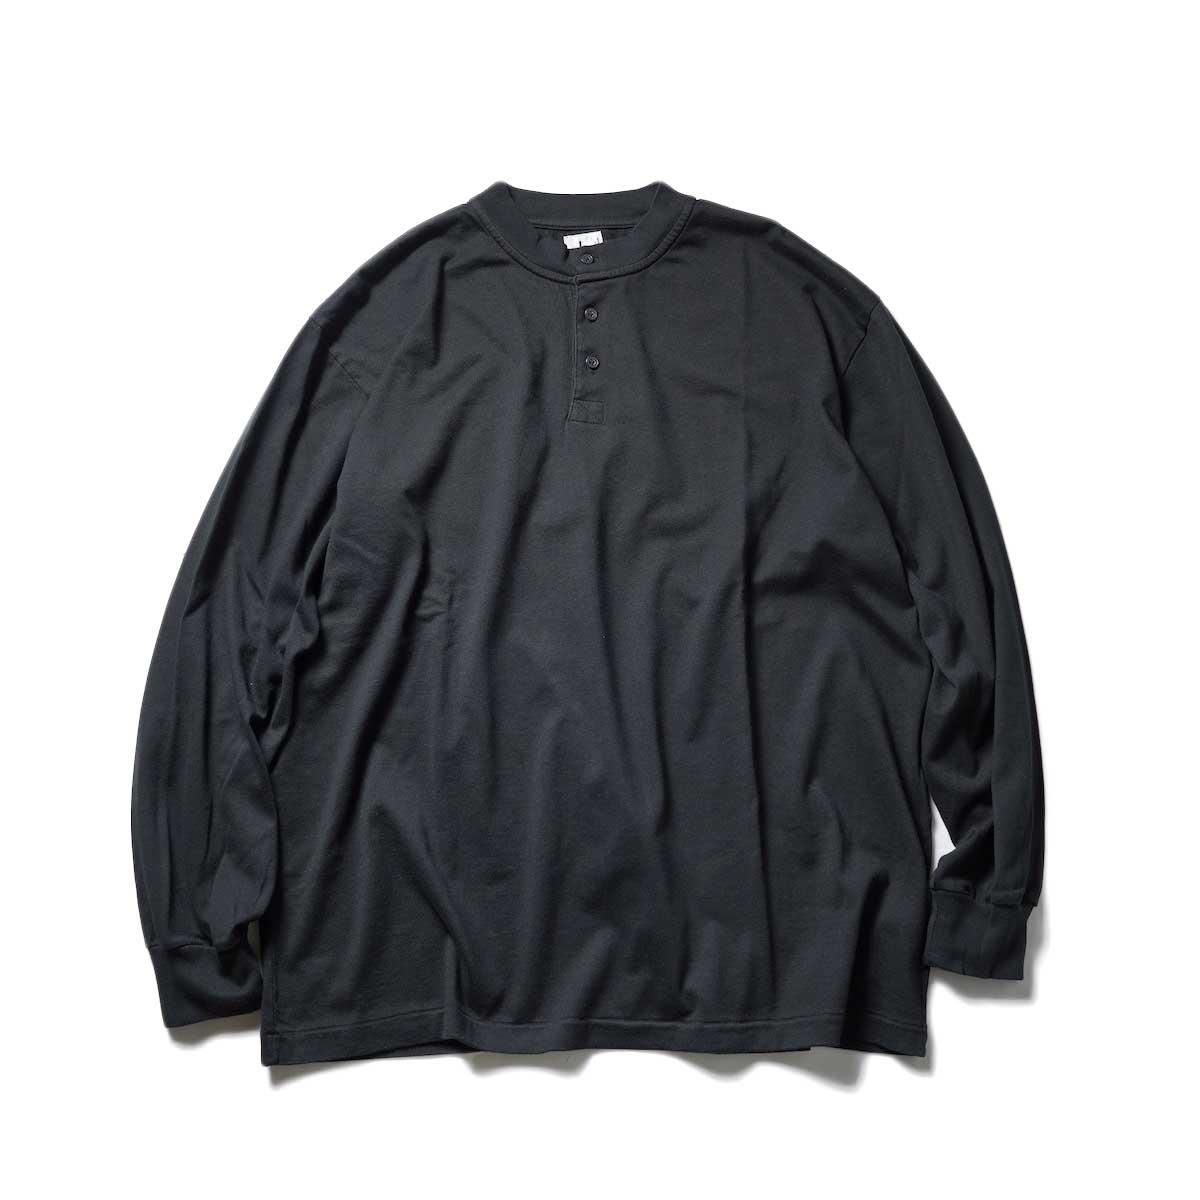 blurhms / Extra Soft Henley-neck BIG L/S (Black)